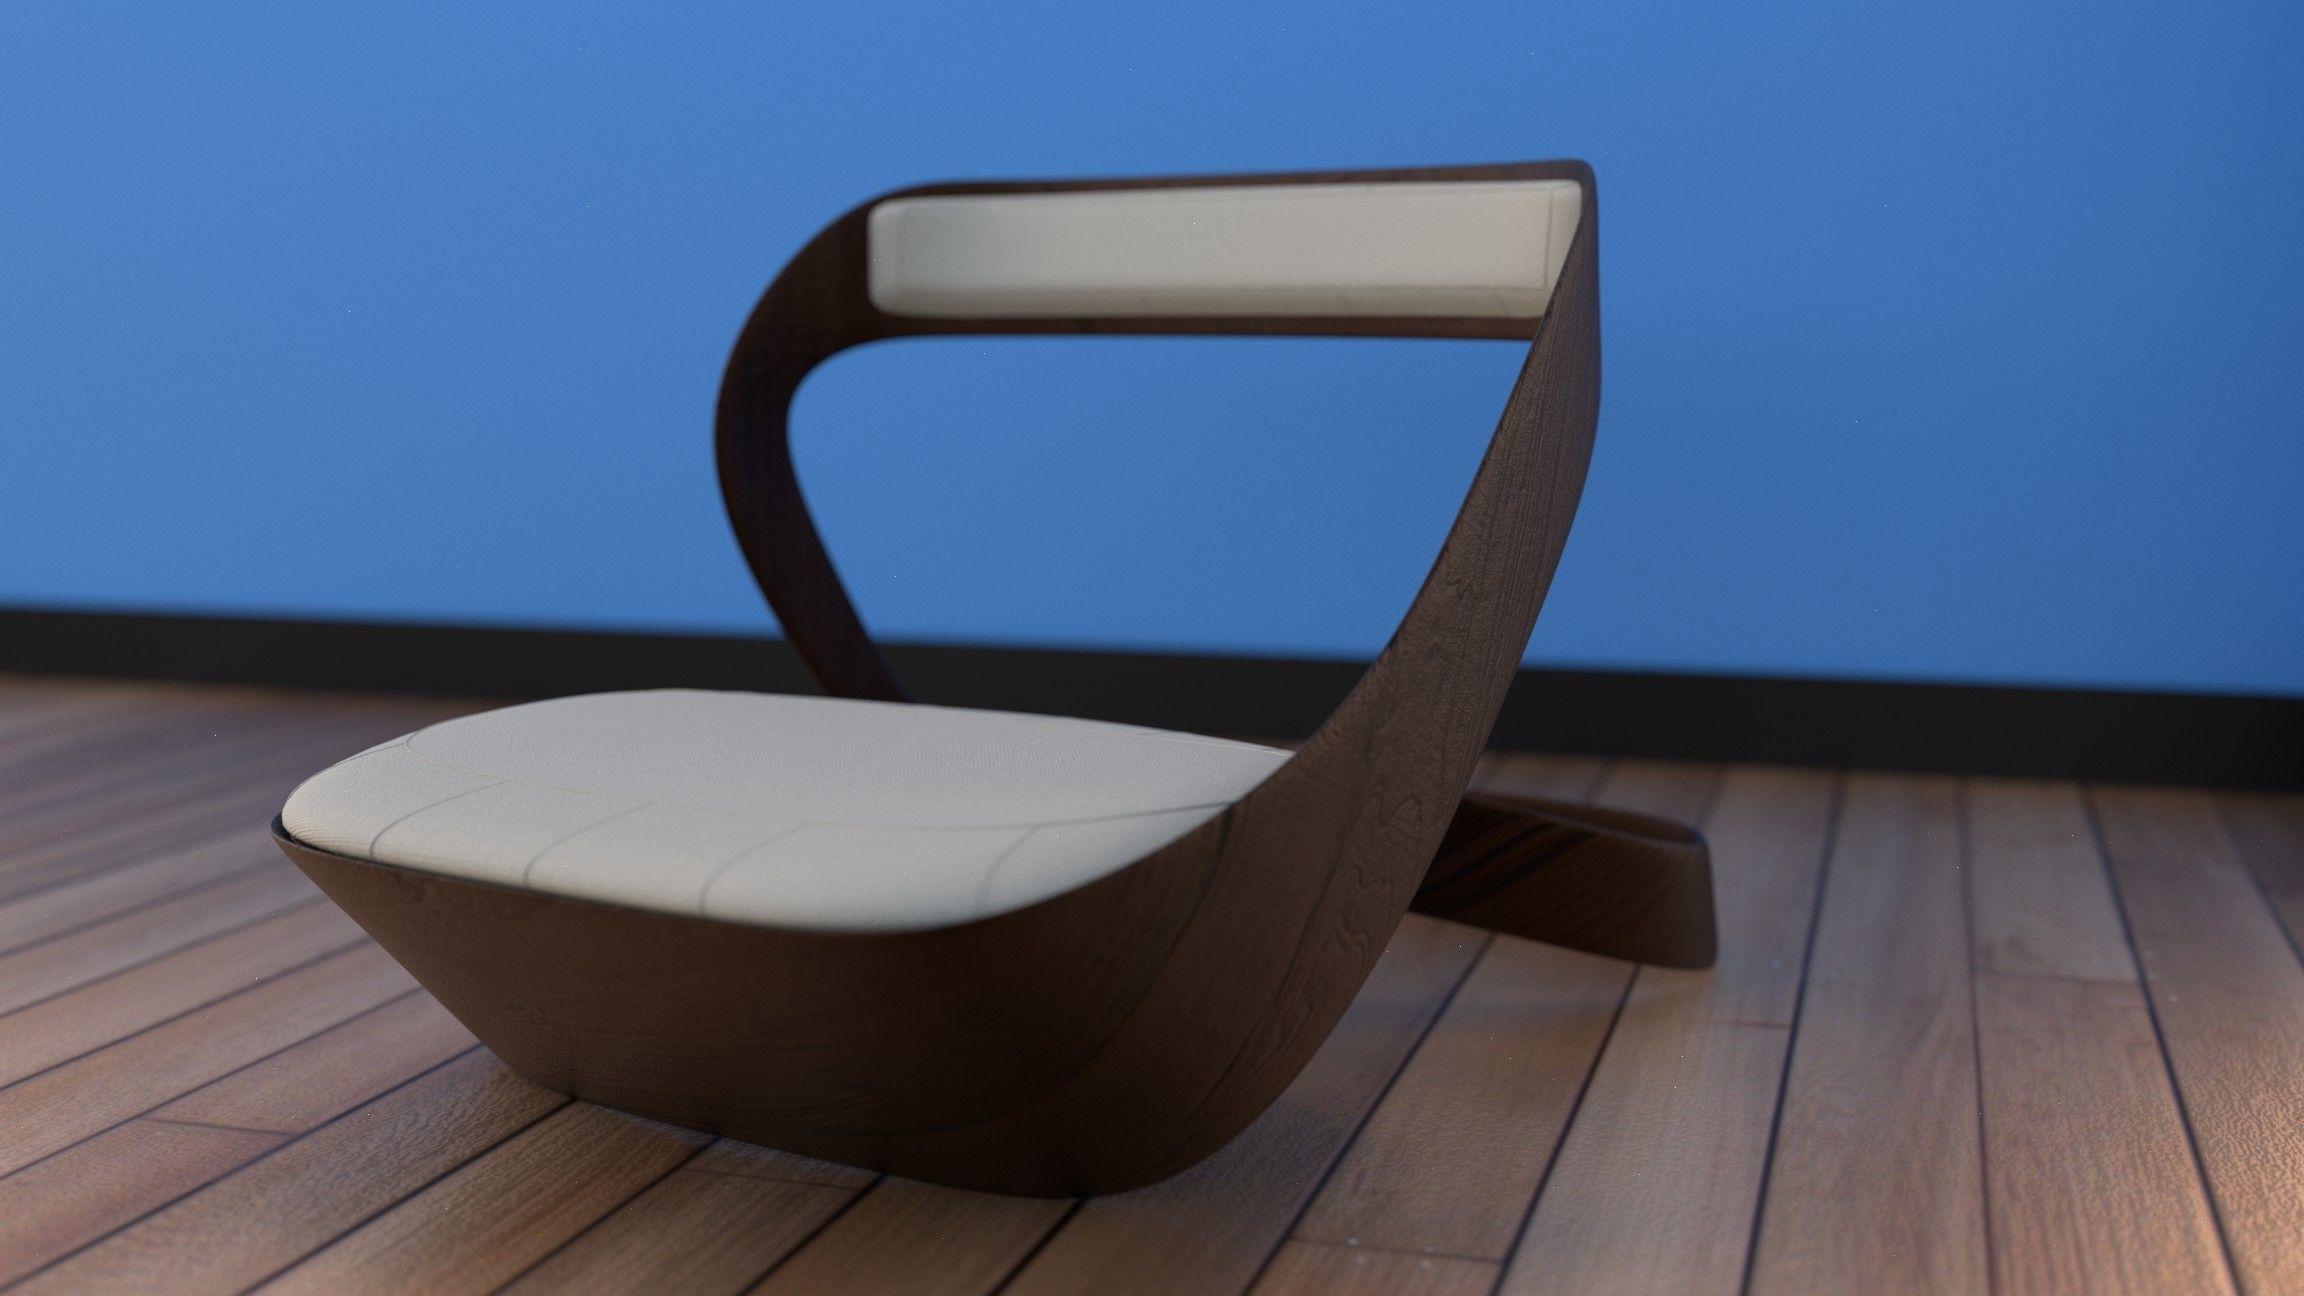 organic chair design